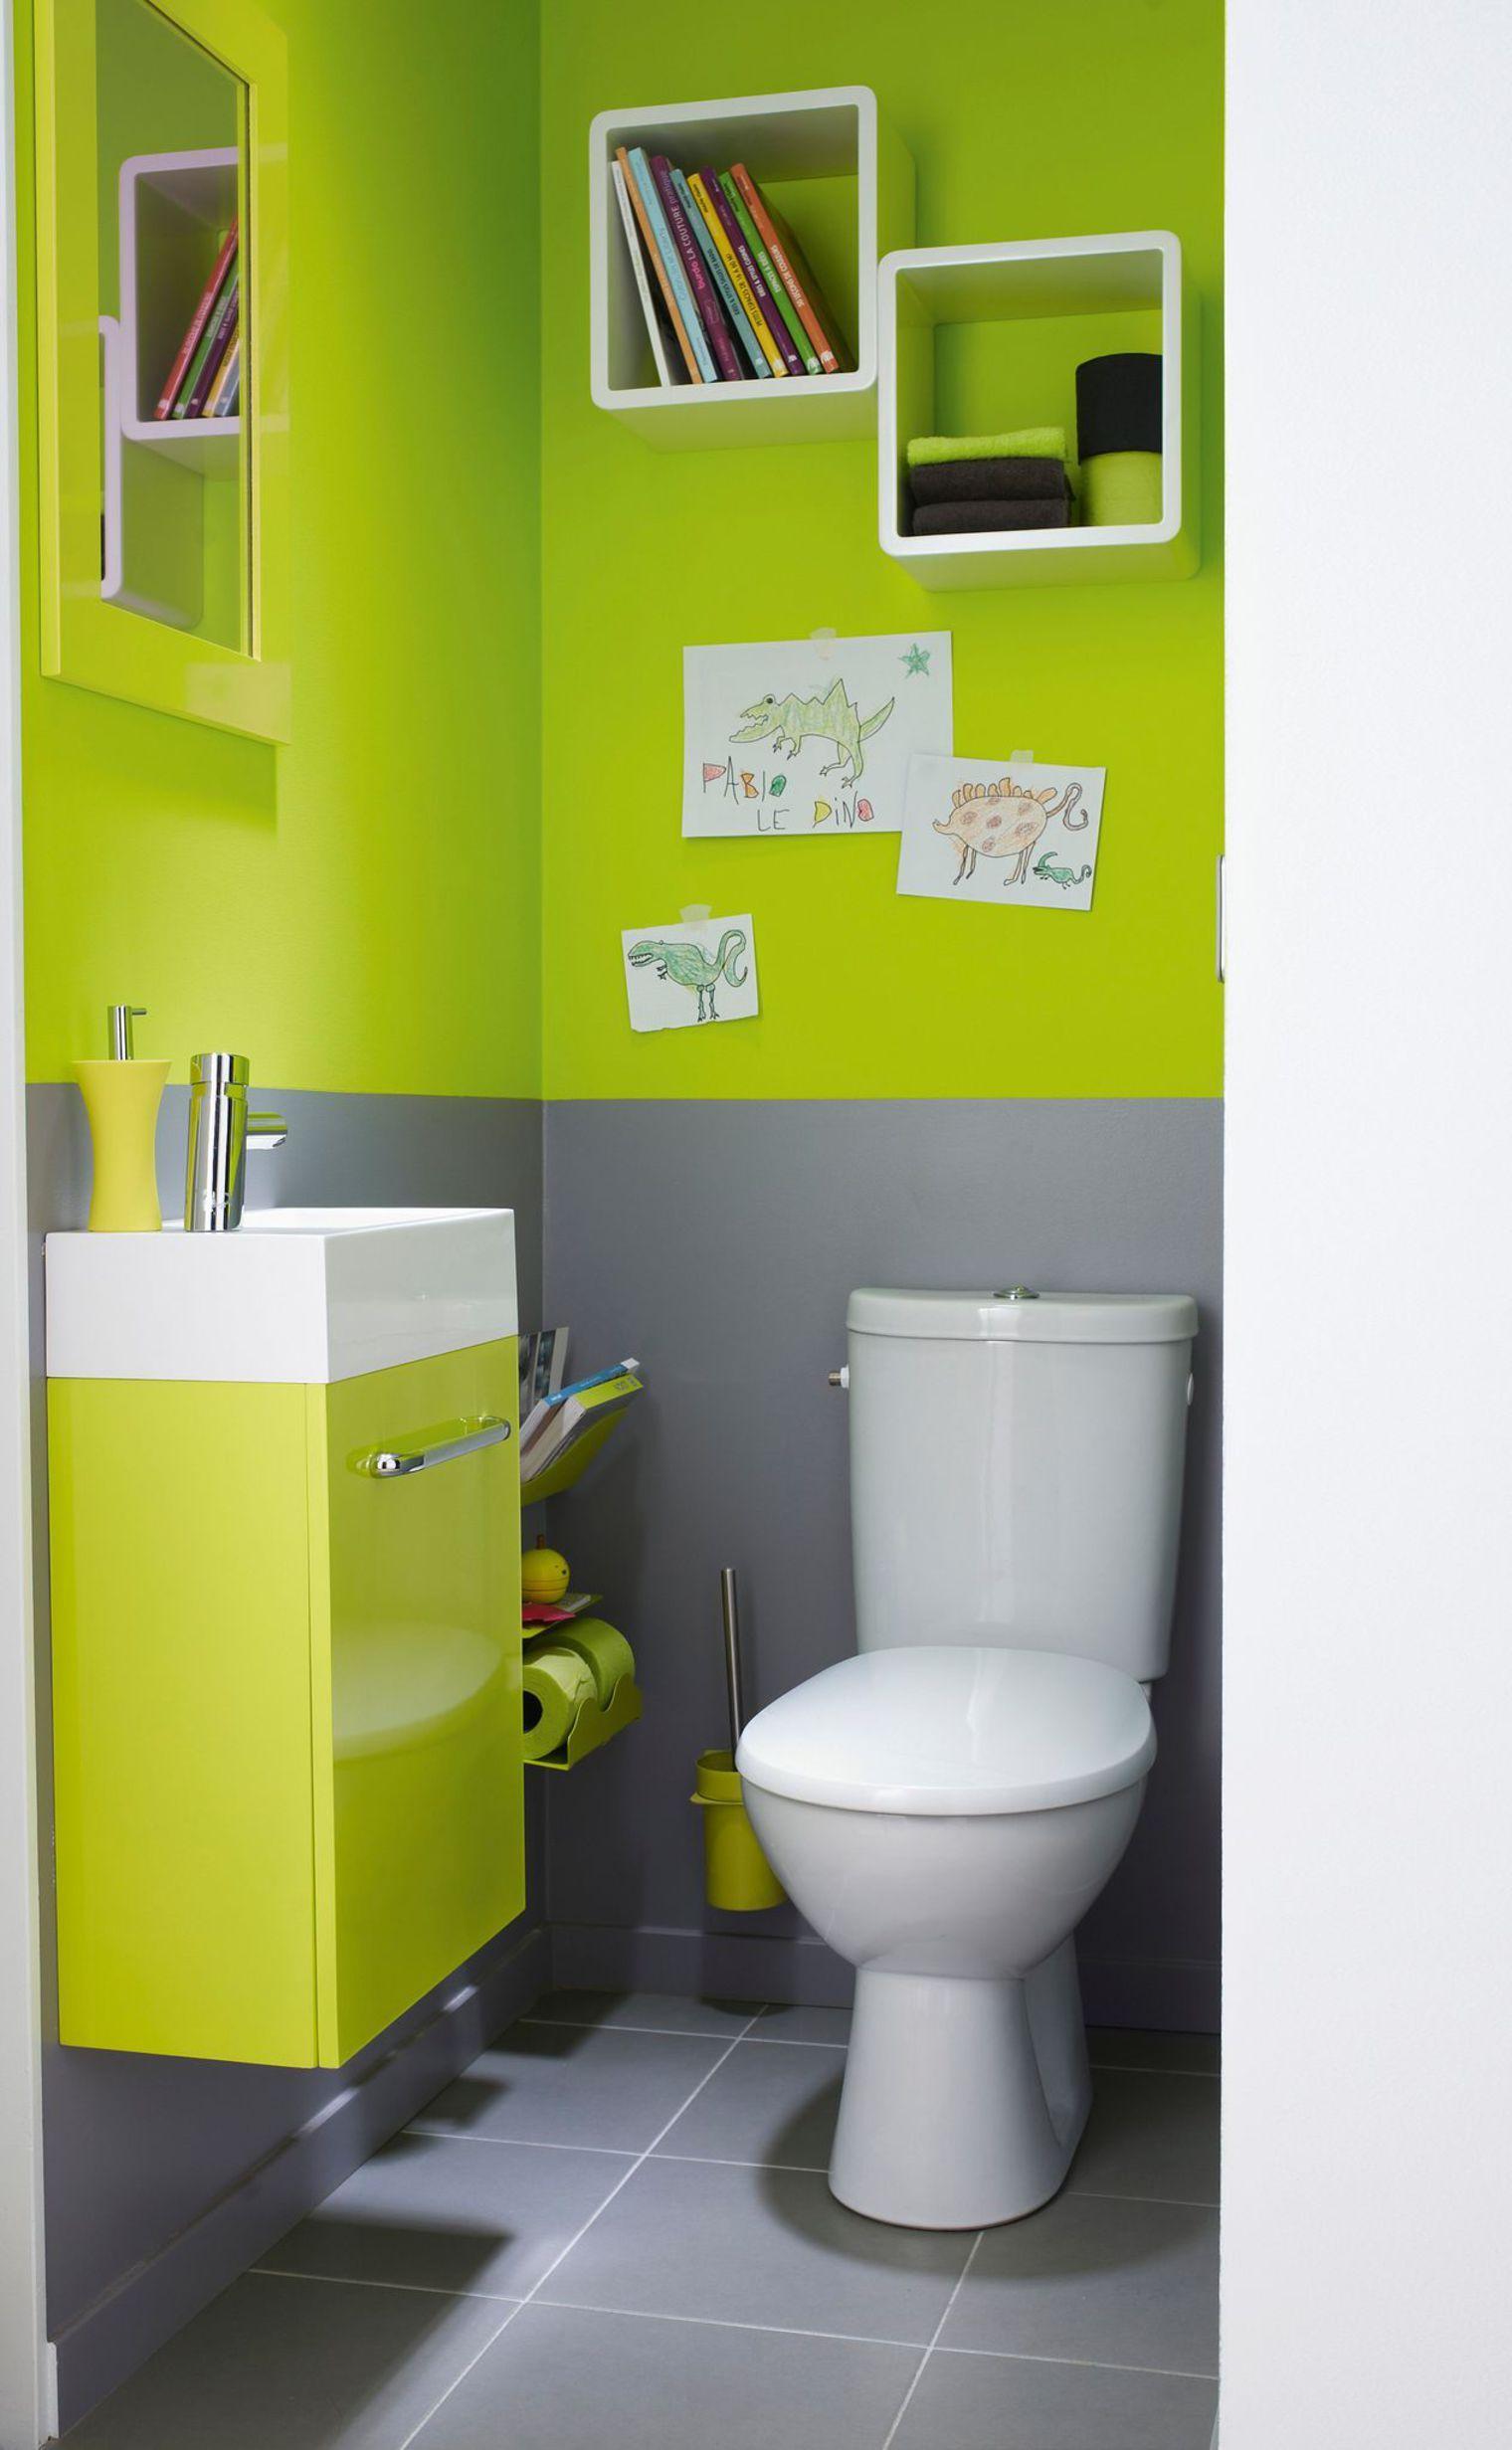 Panneaux Stratifies Salle De Bain Leroy Merlin ~ d co wc vert d co wc pinterest searching